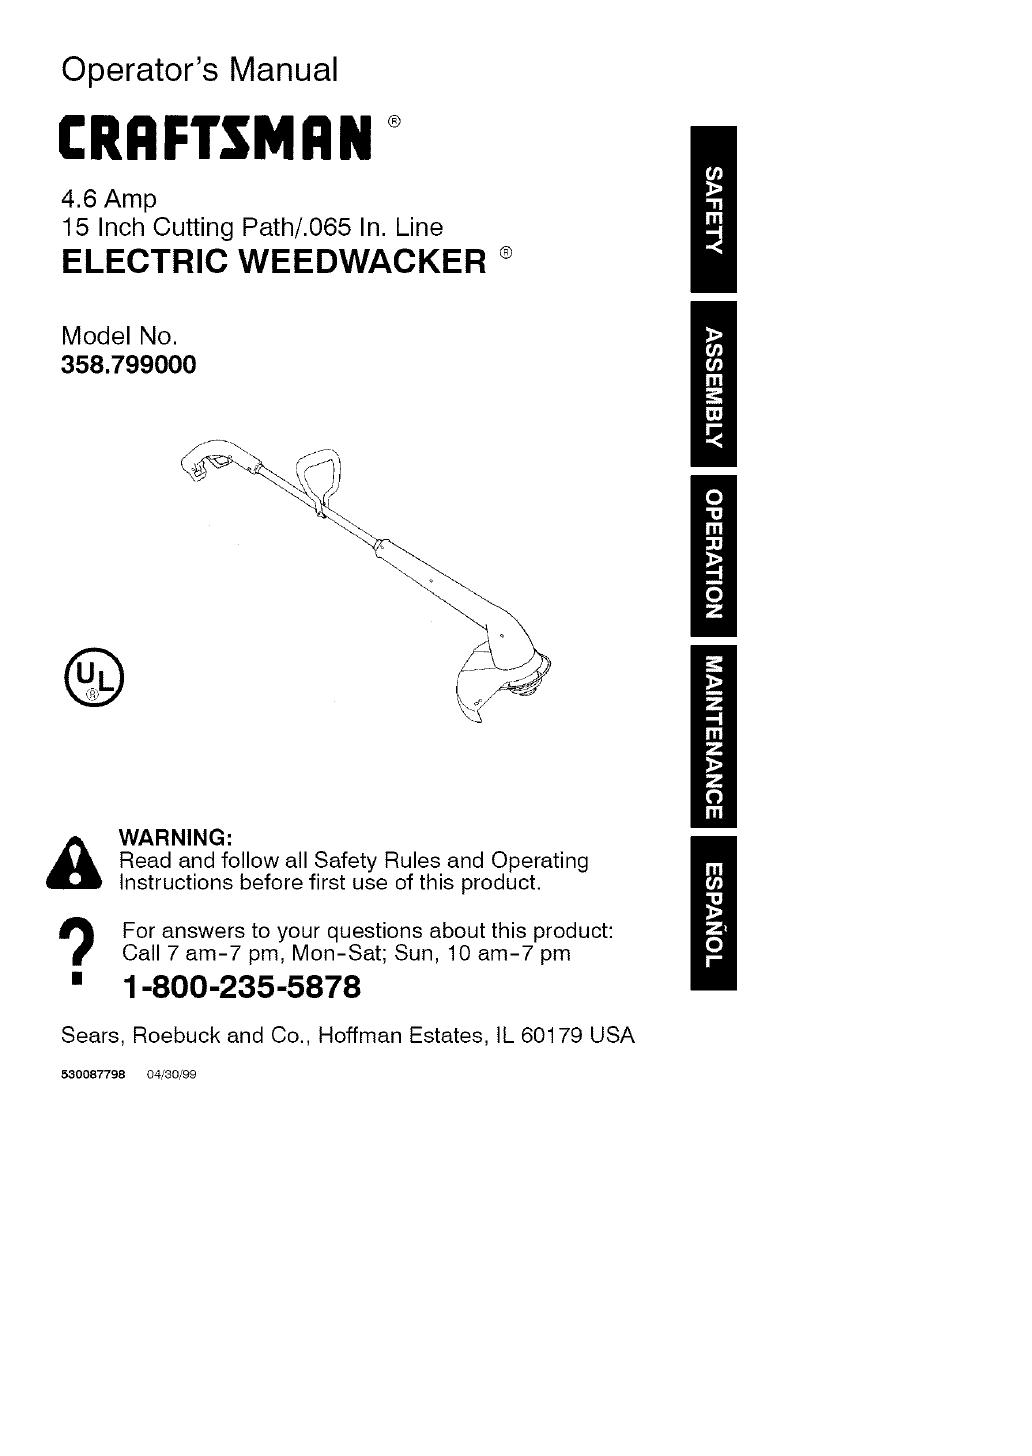 craftsman weedwacker ez fire manual open source user manual u2022 rh dramatic varieties com Craftsman Snow Blower Parts Manuals Craftsman LT 2000 Manual PDF